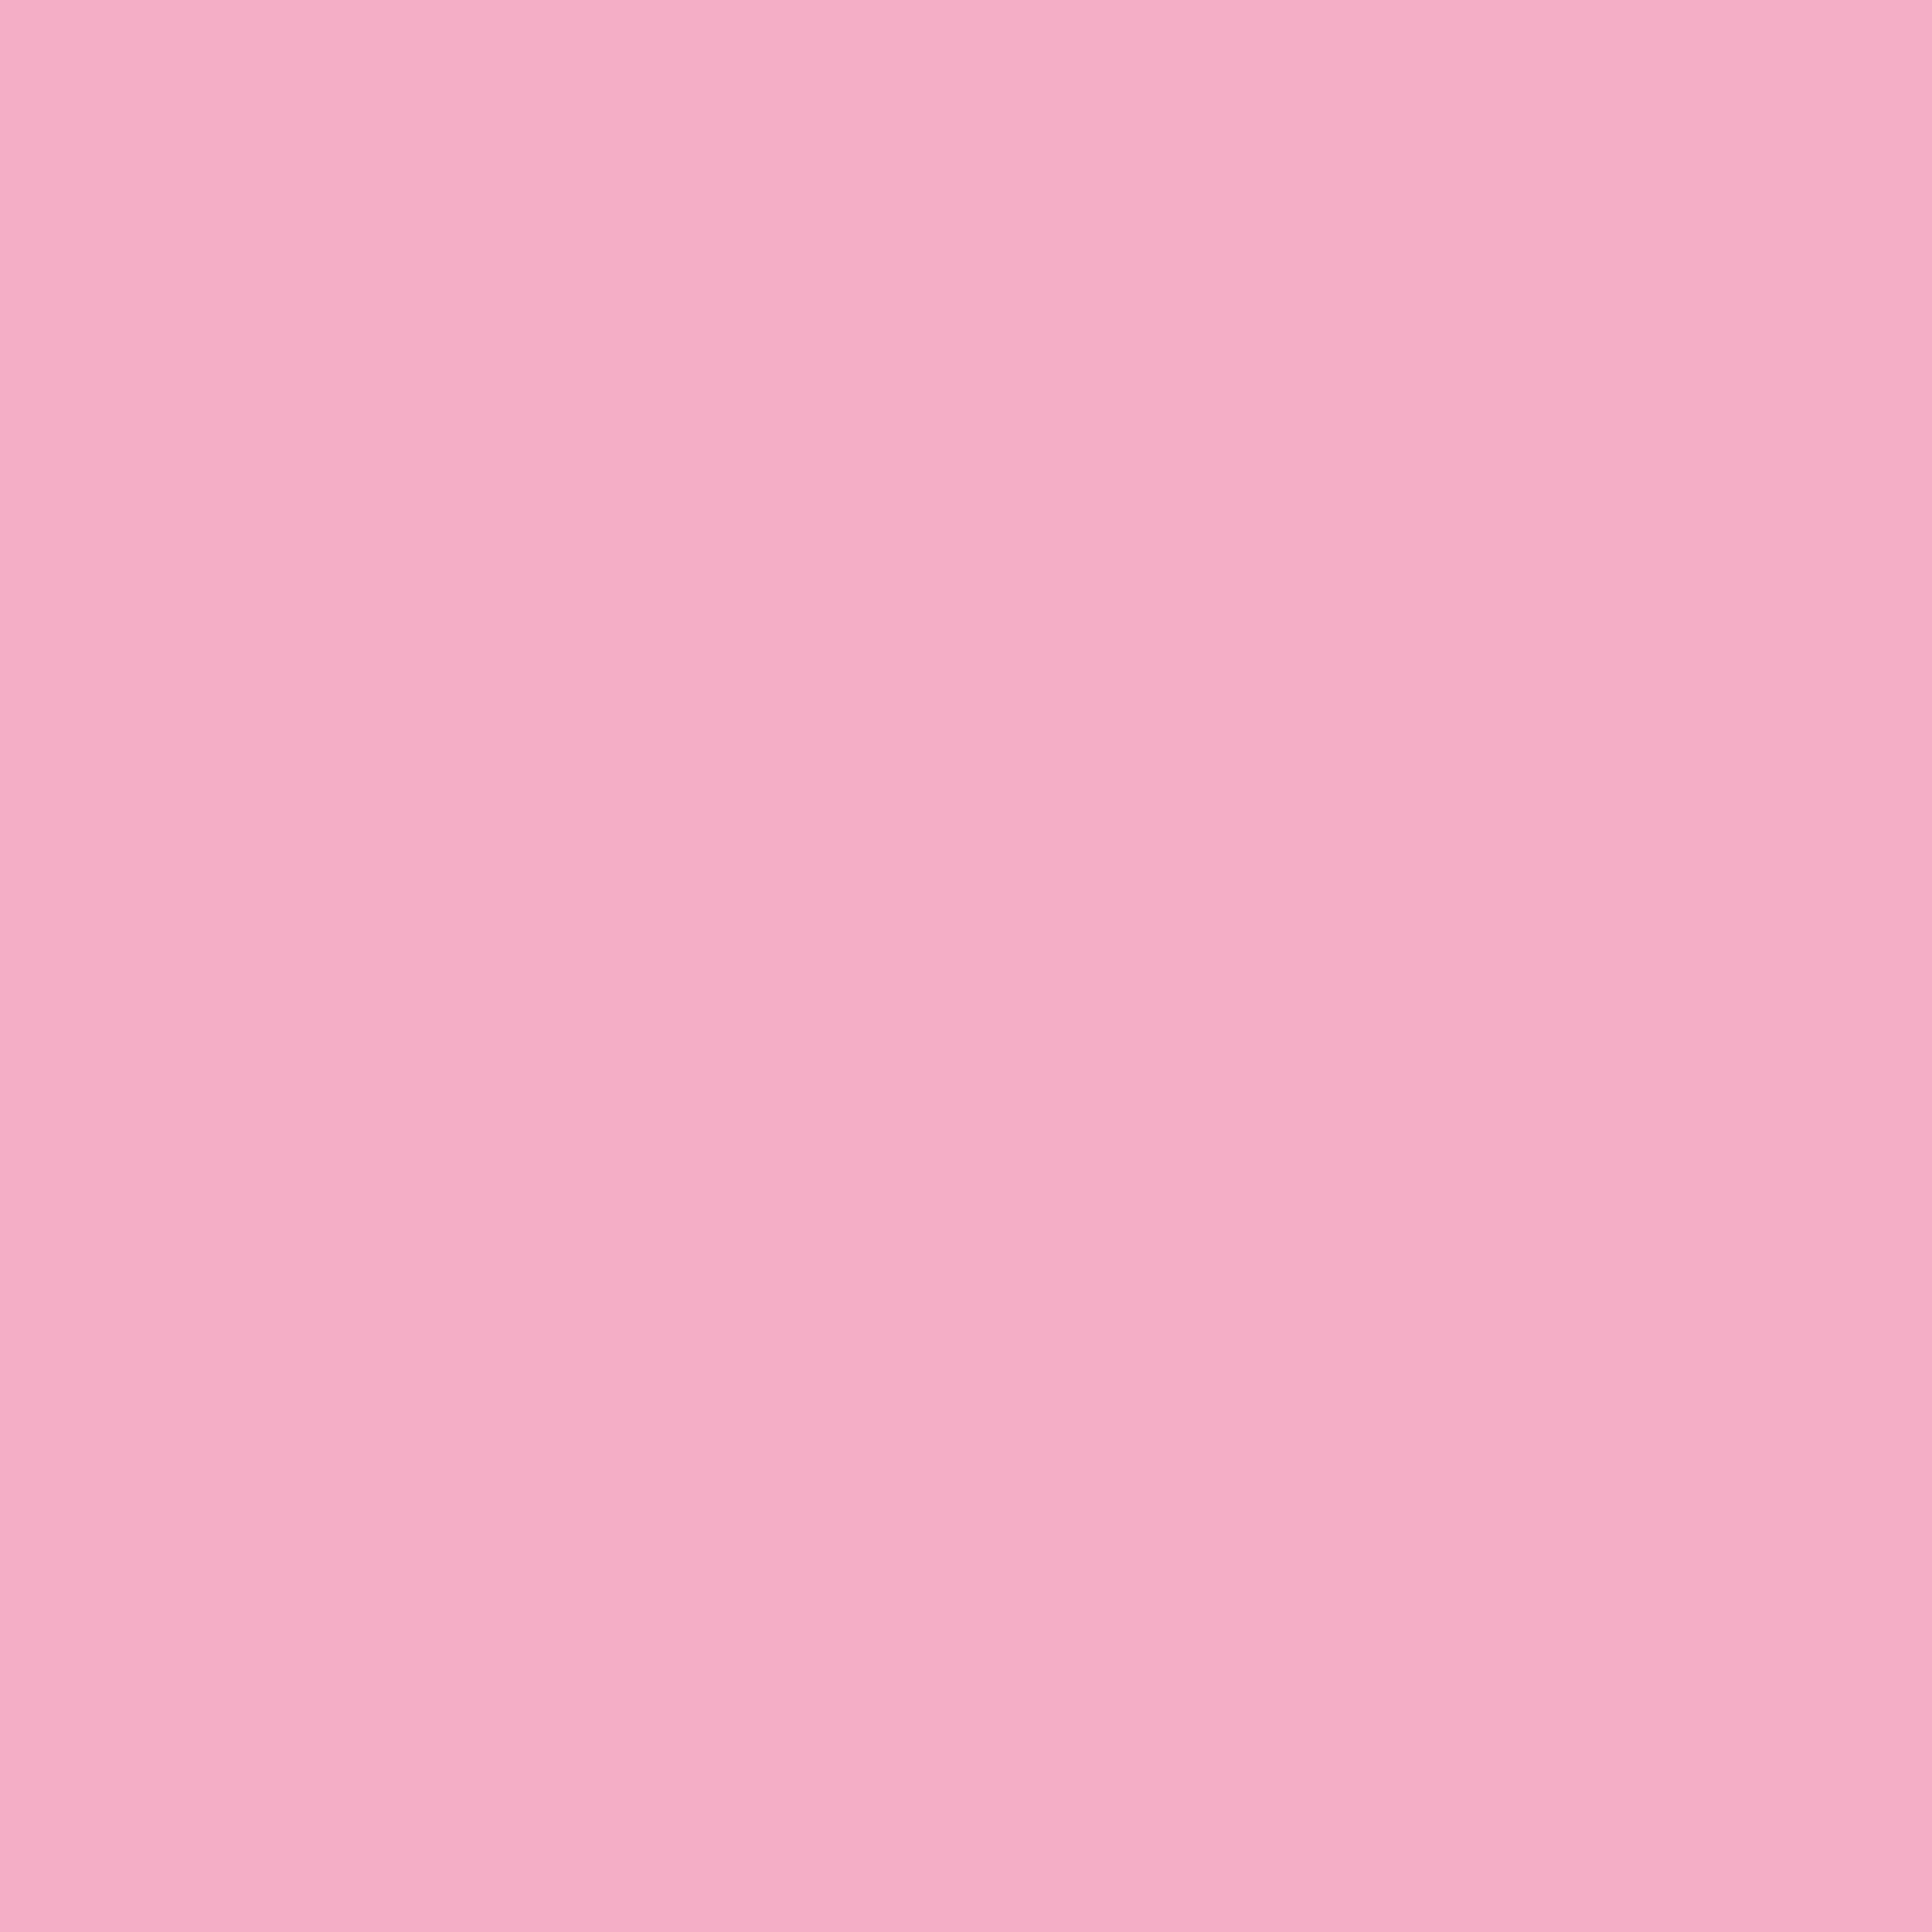 3600x3600 Nadeshiko Pink Solid Color Background